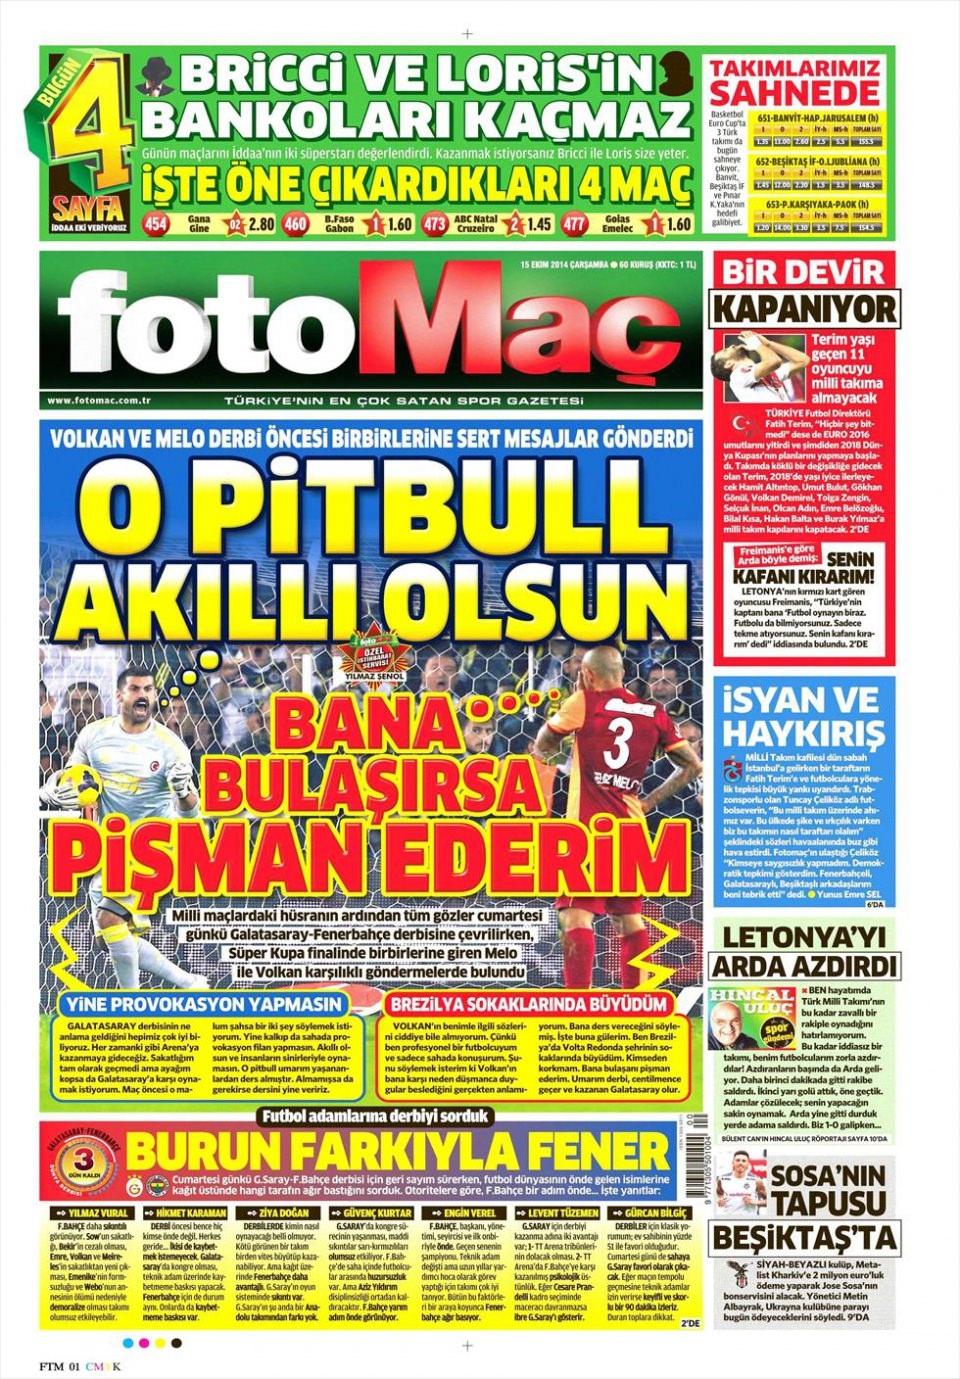 15 Ekim 2015 gazete manşetleri 7